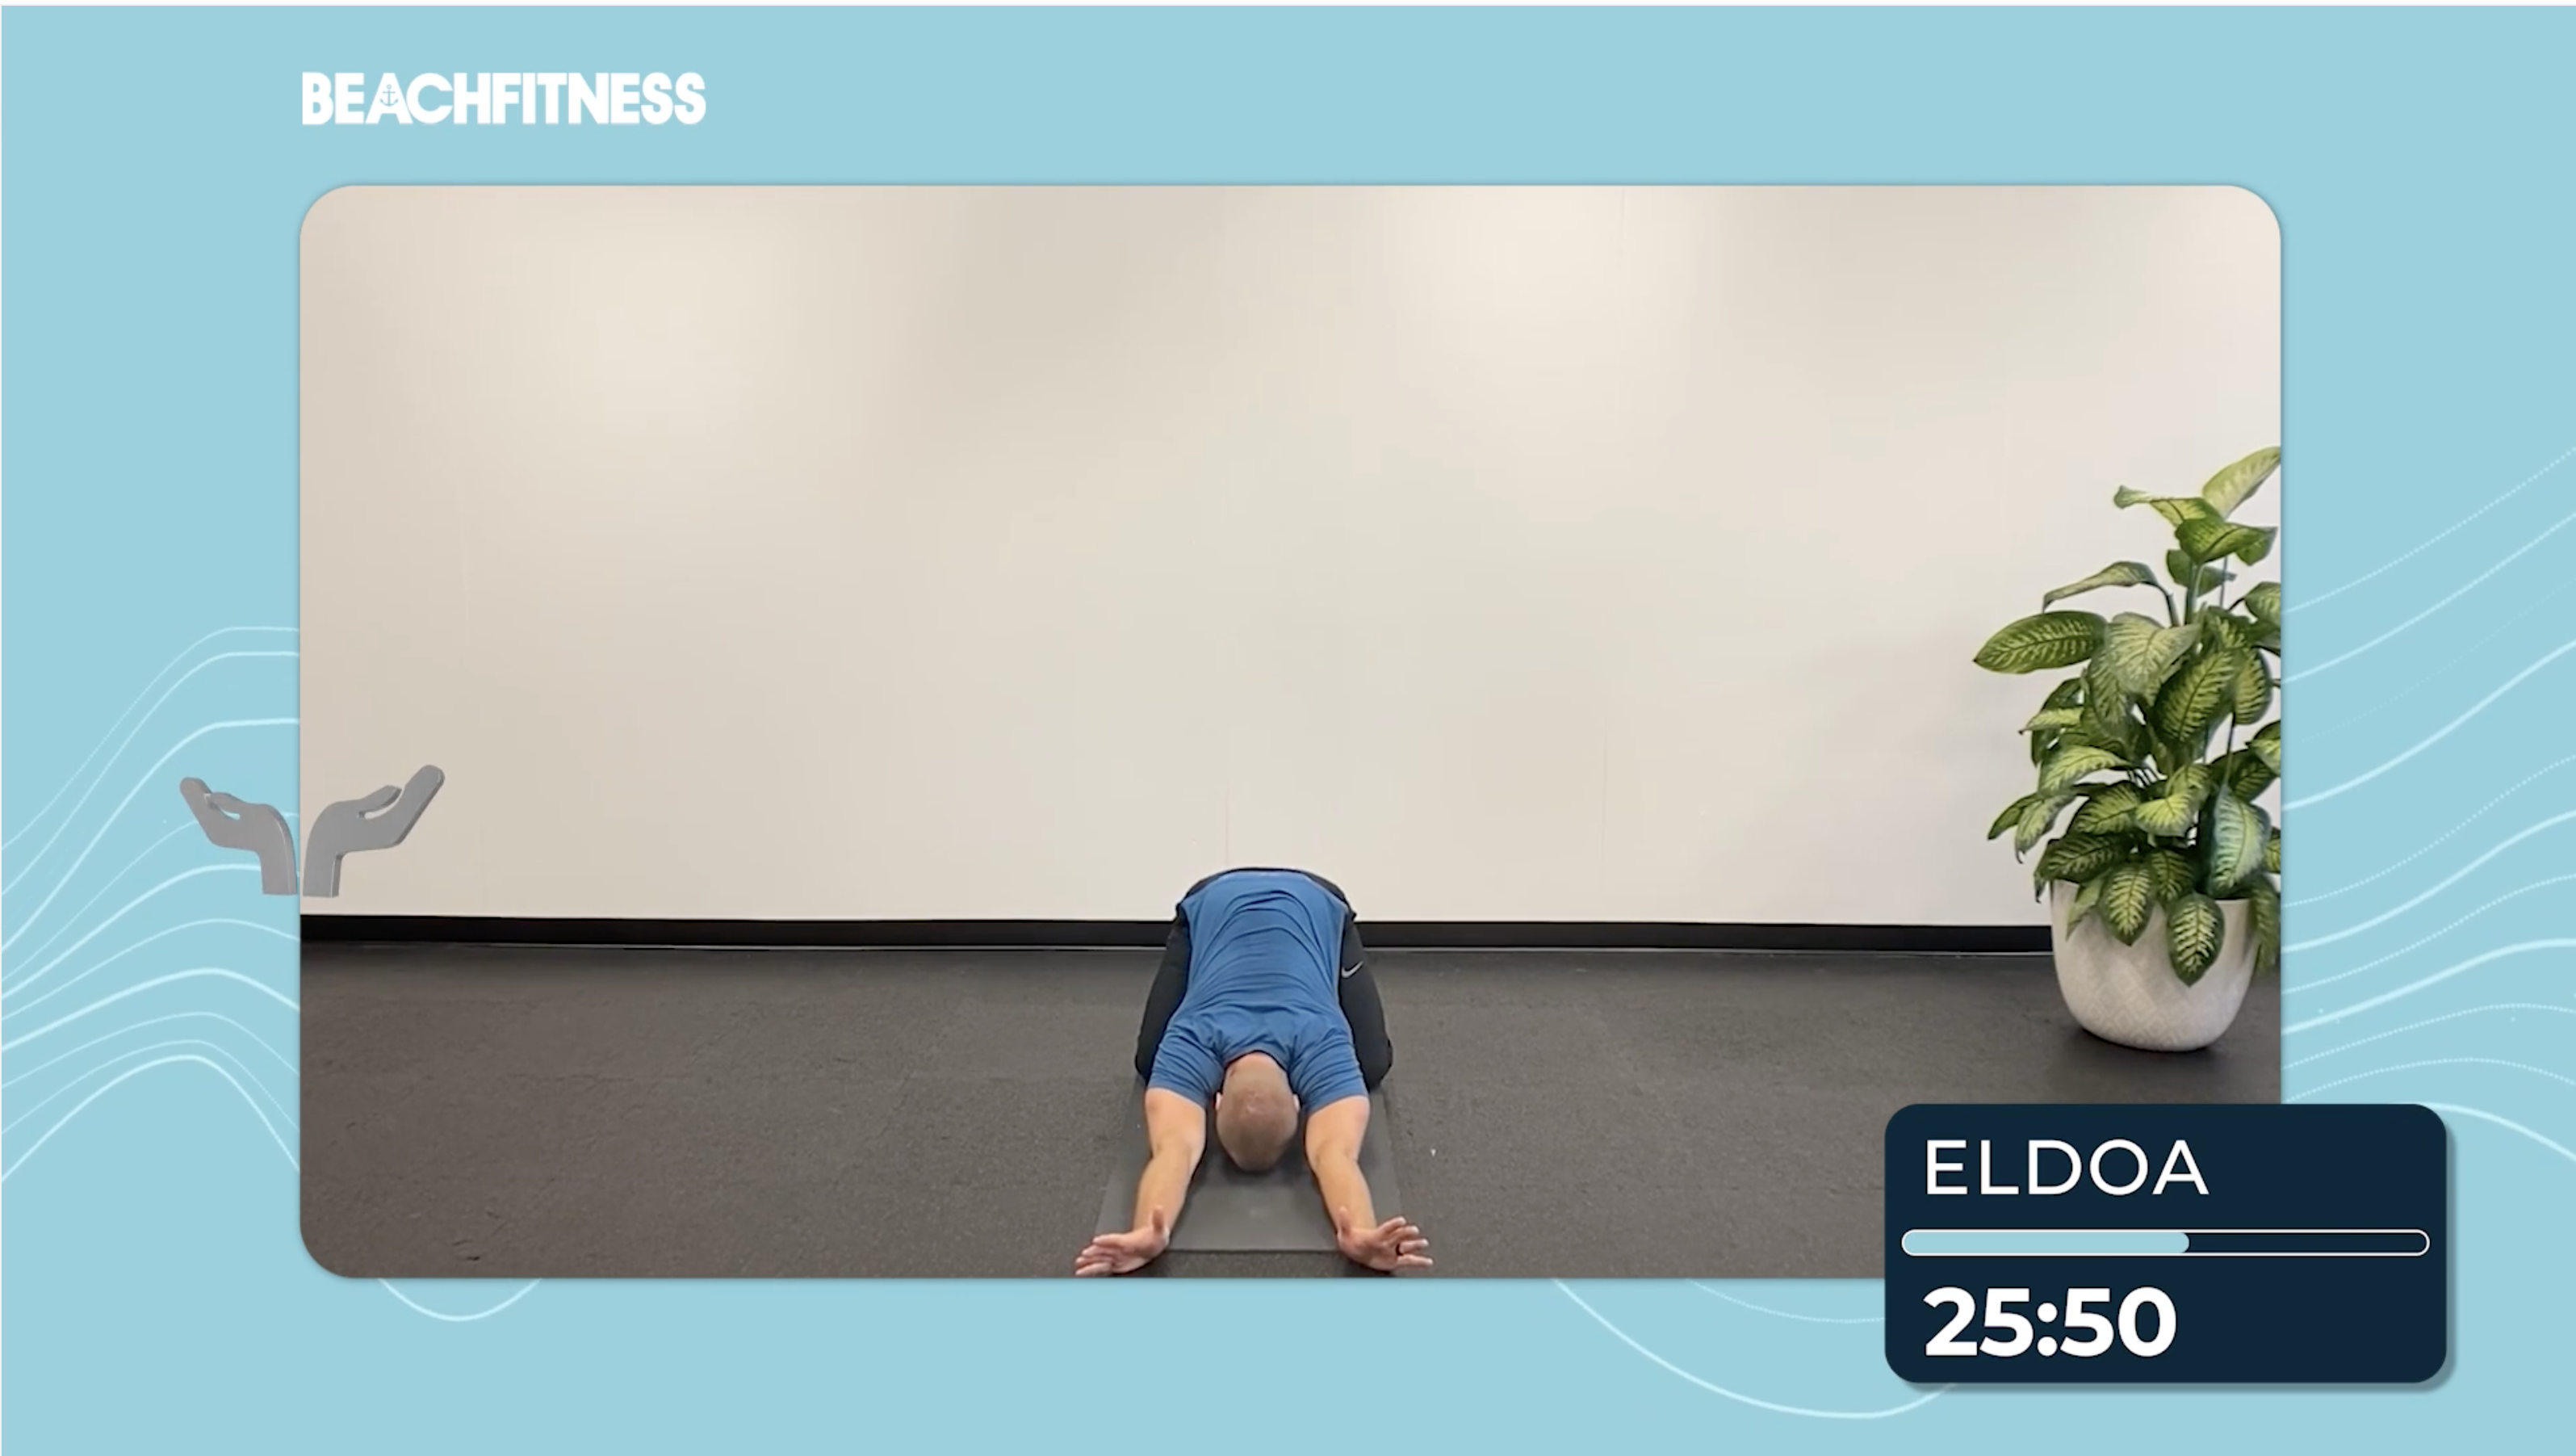 ELDOA | Full Body Flexibility